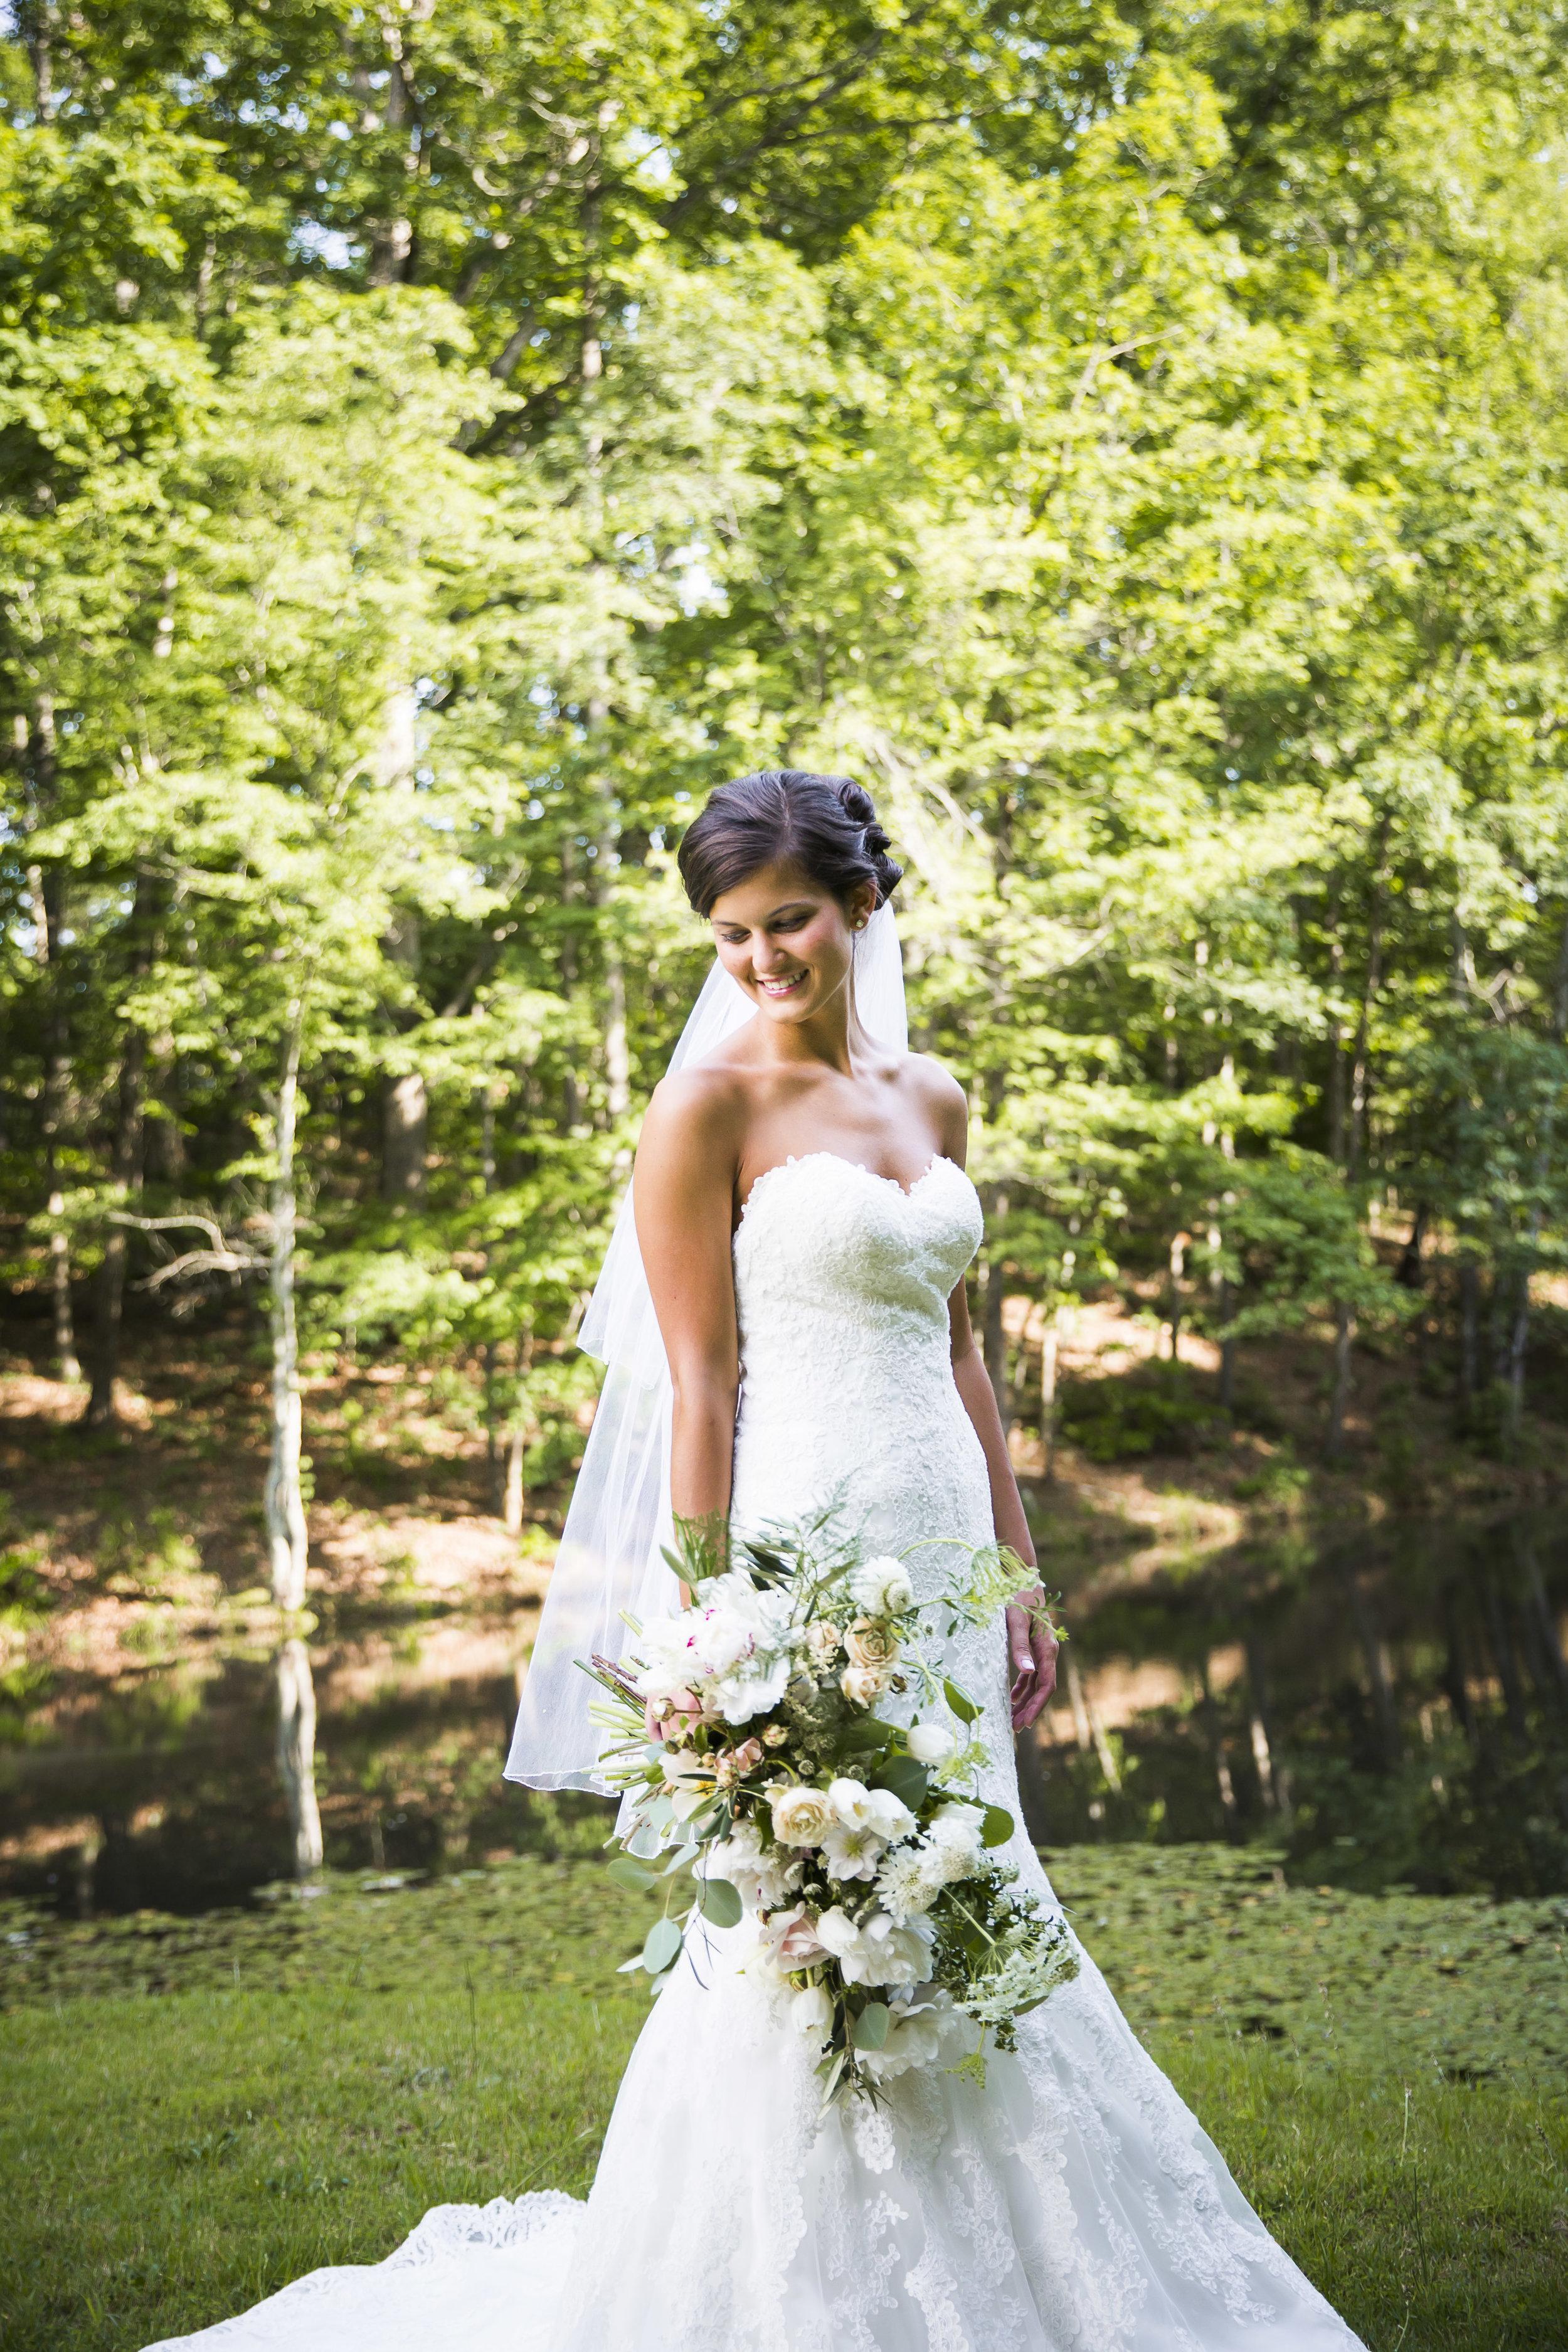 Perkins Wedding-162-(ZF-9700-01748-1-003).jpg